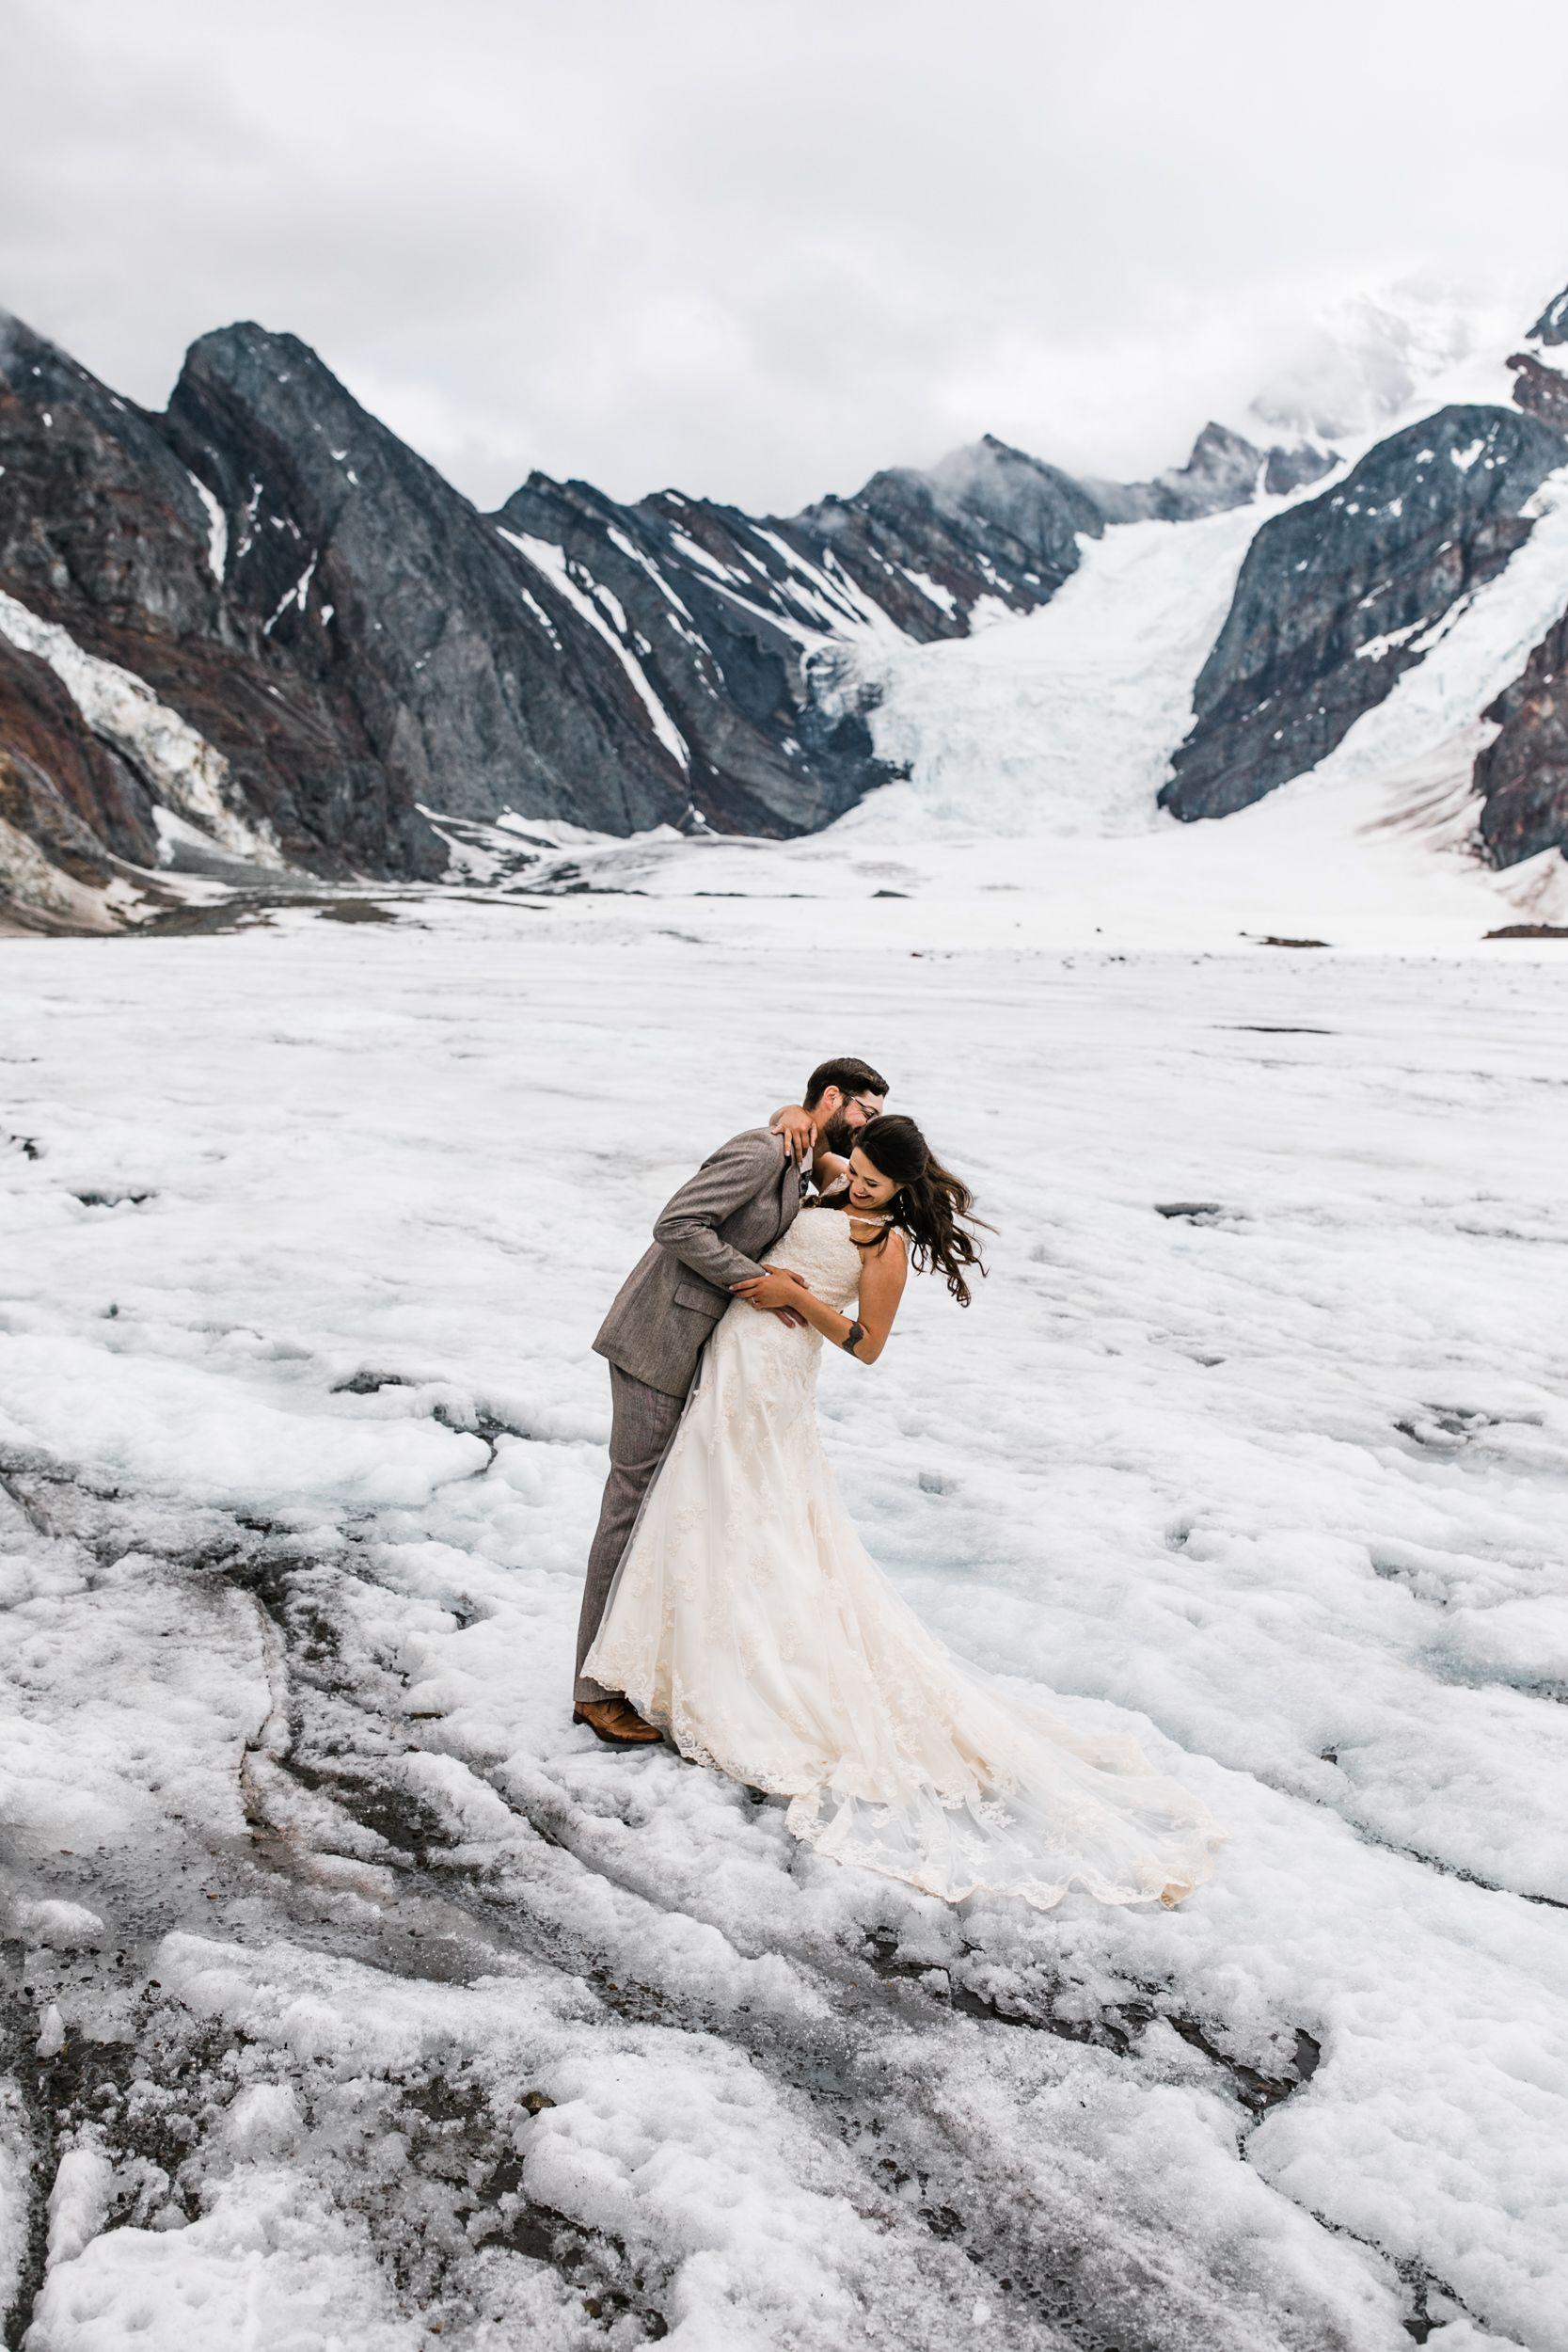 Helicopter Tour Wedding Photography In Denali National Park Alaska Destination Elopement Photographer Adventure Wedding Elopement Photographers In Moab Y Alaska Wedding Alaska Destinations Adventure Wedding [ 2500 x 1667 Pixel ]